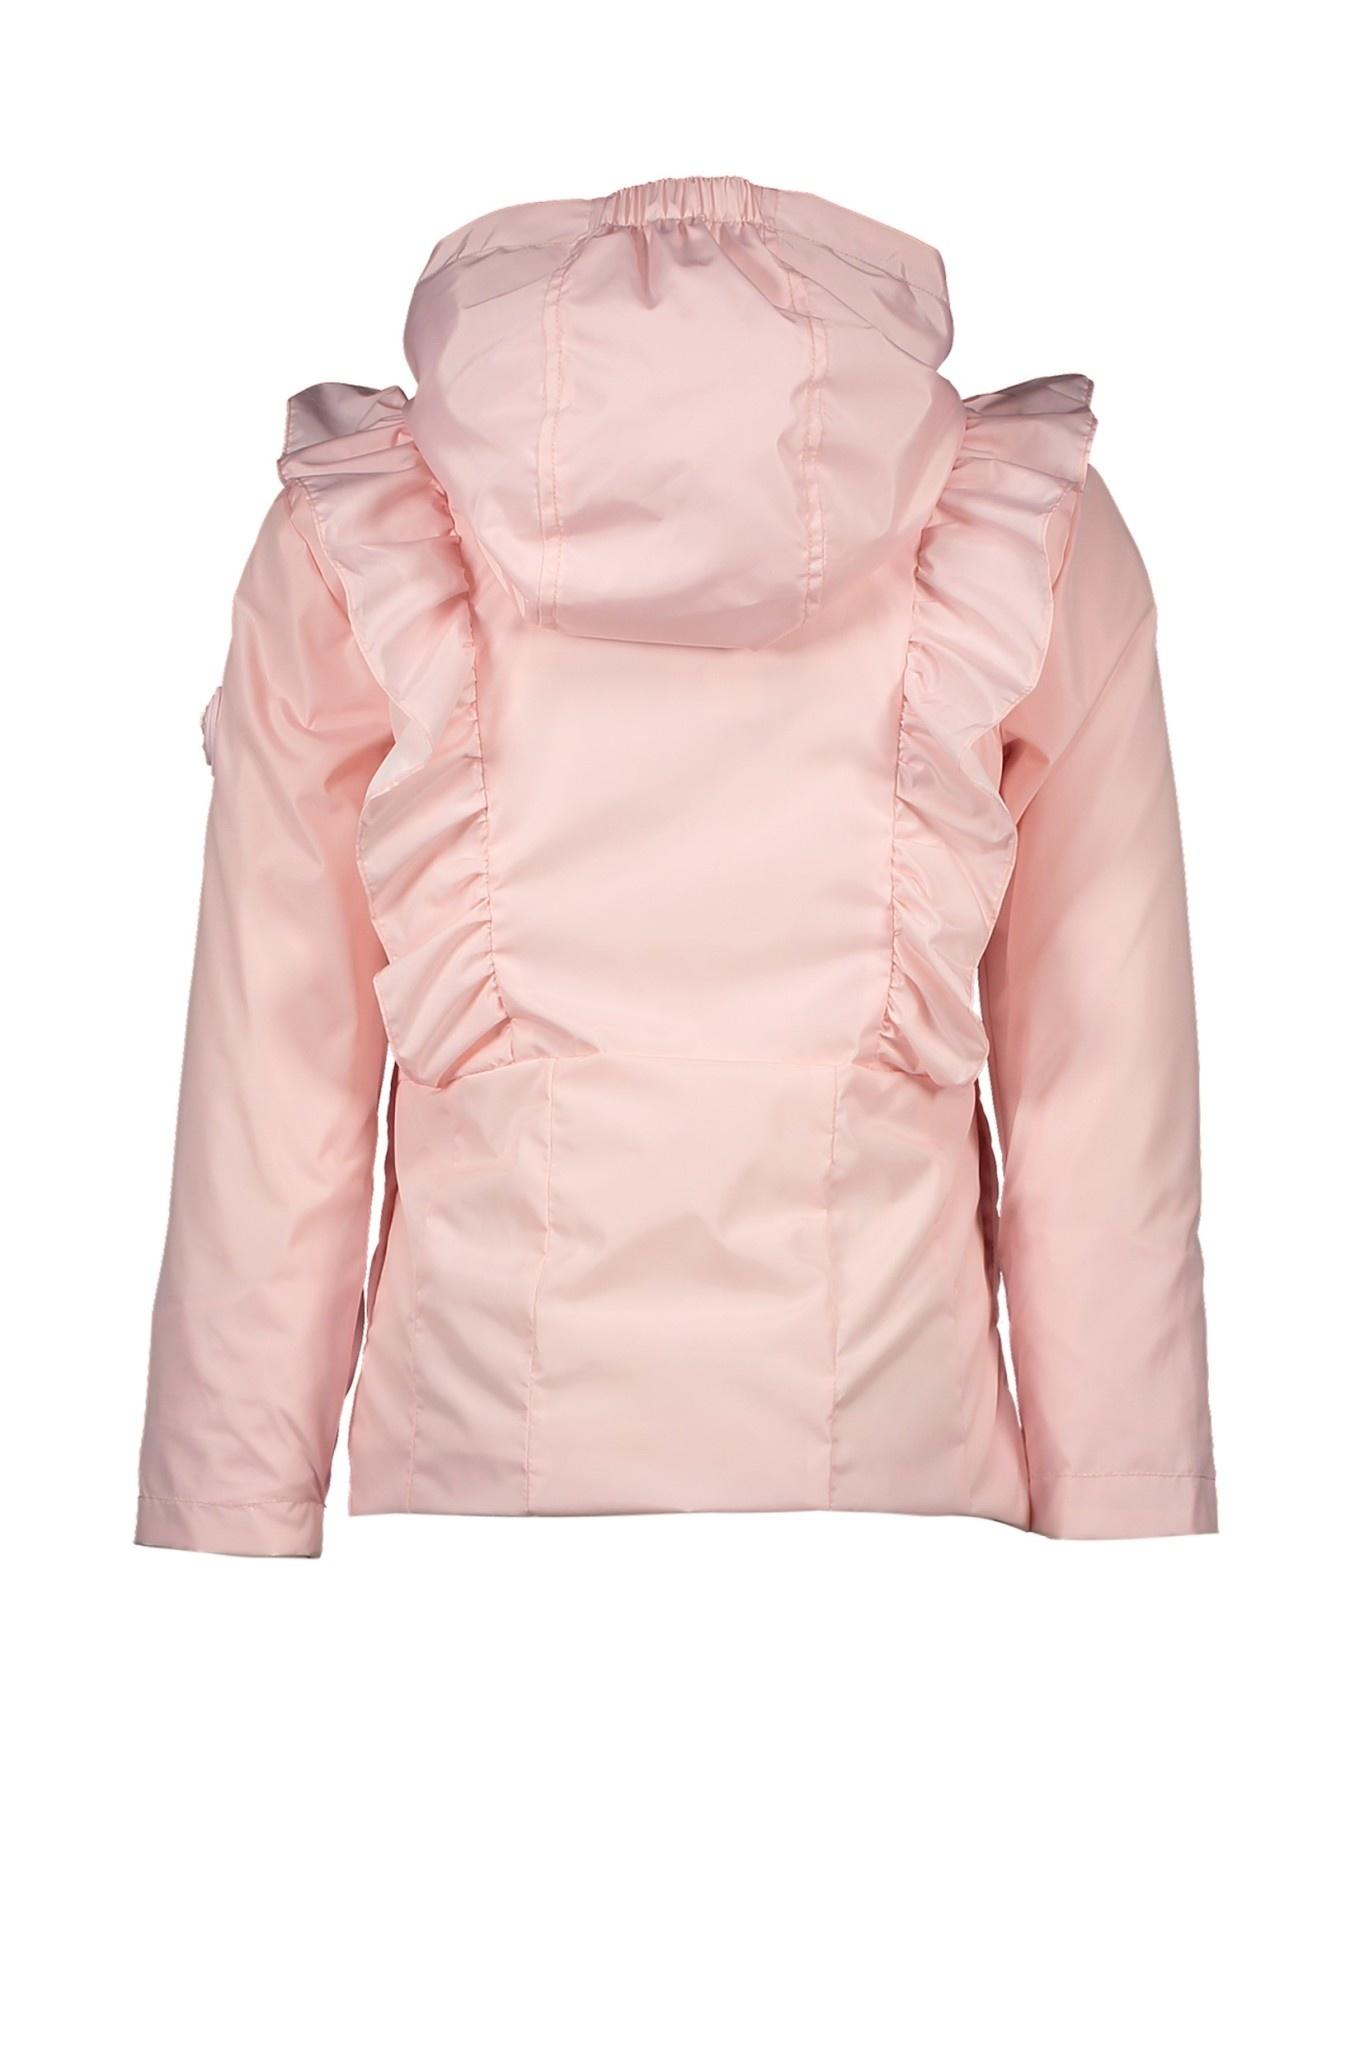 Lechic Le Chic Short Pink Ruffle Coat 5202